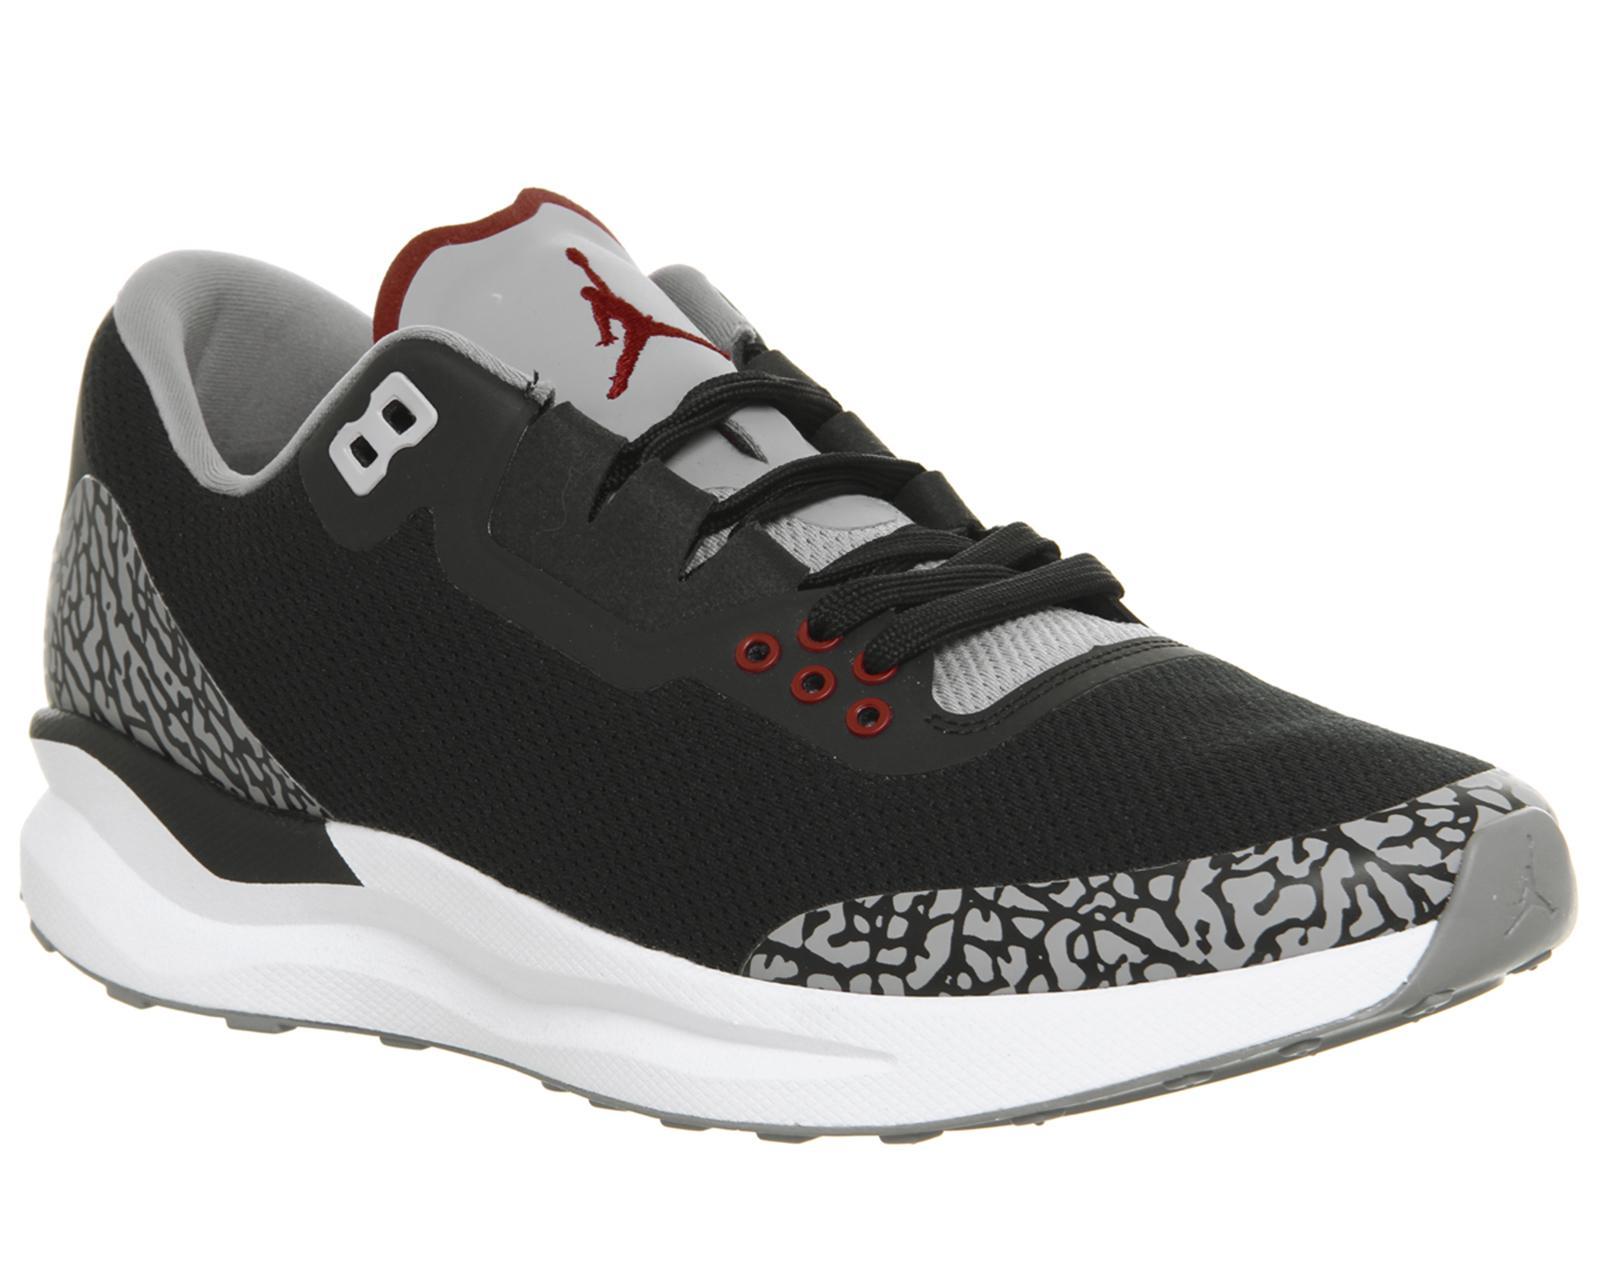 Nike Zoom Tenacity 88 in Black for Men - Lyst 065d47a2d